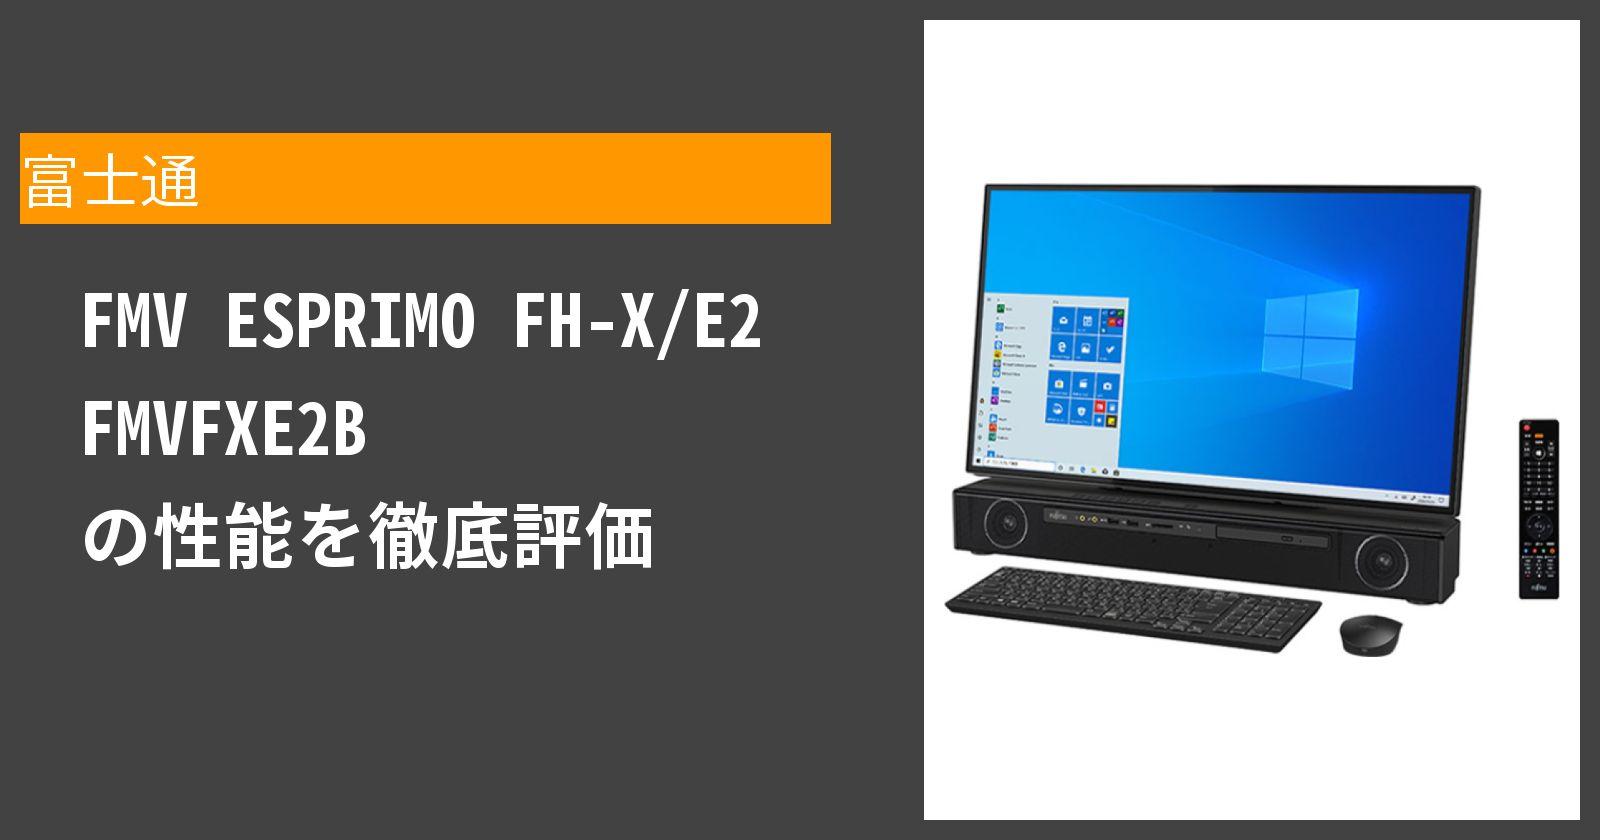 FMV ESPRIMO FH-X/E2 FMVFXE2B の性能を徹底評価